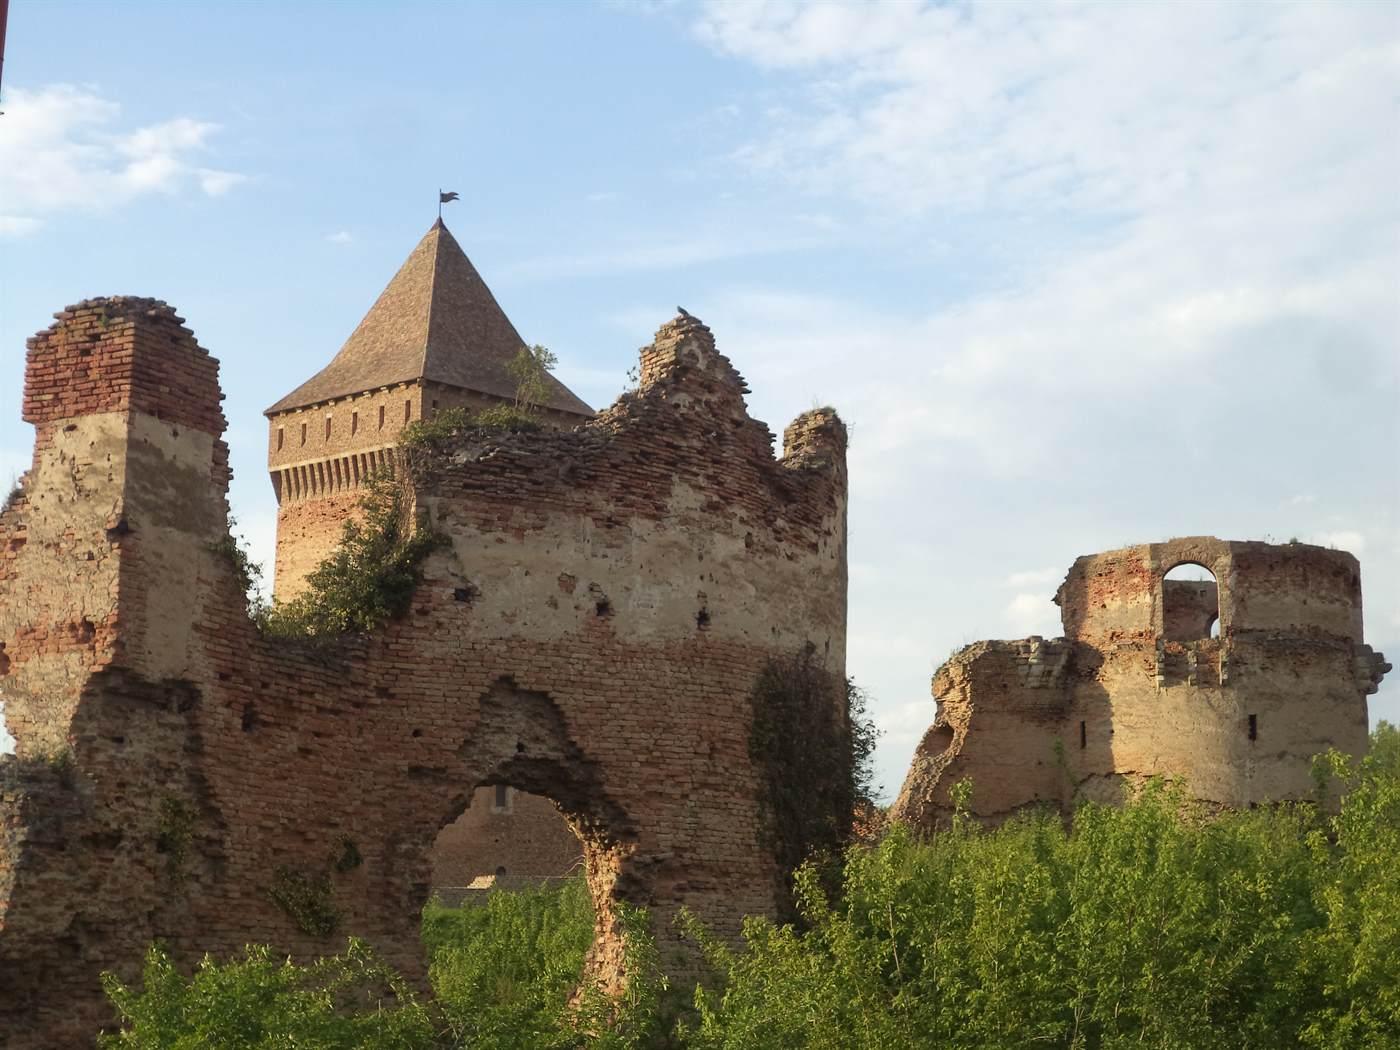 Bačka tvrđava – čuvar vojvođanske ravnice